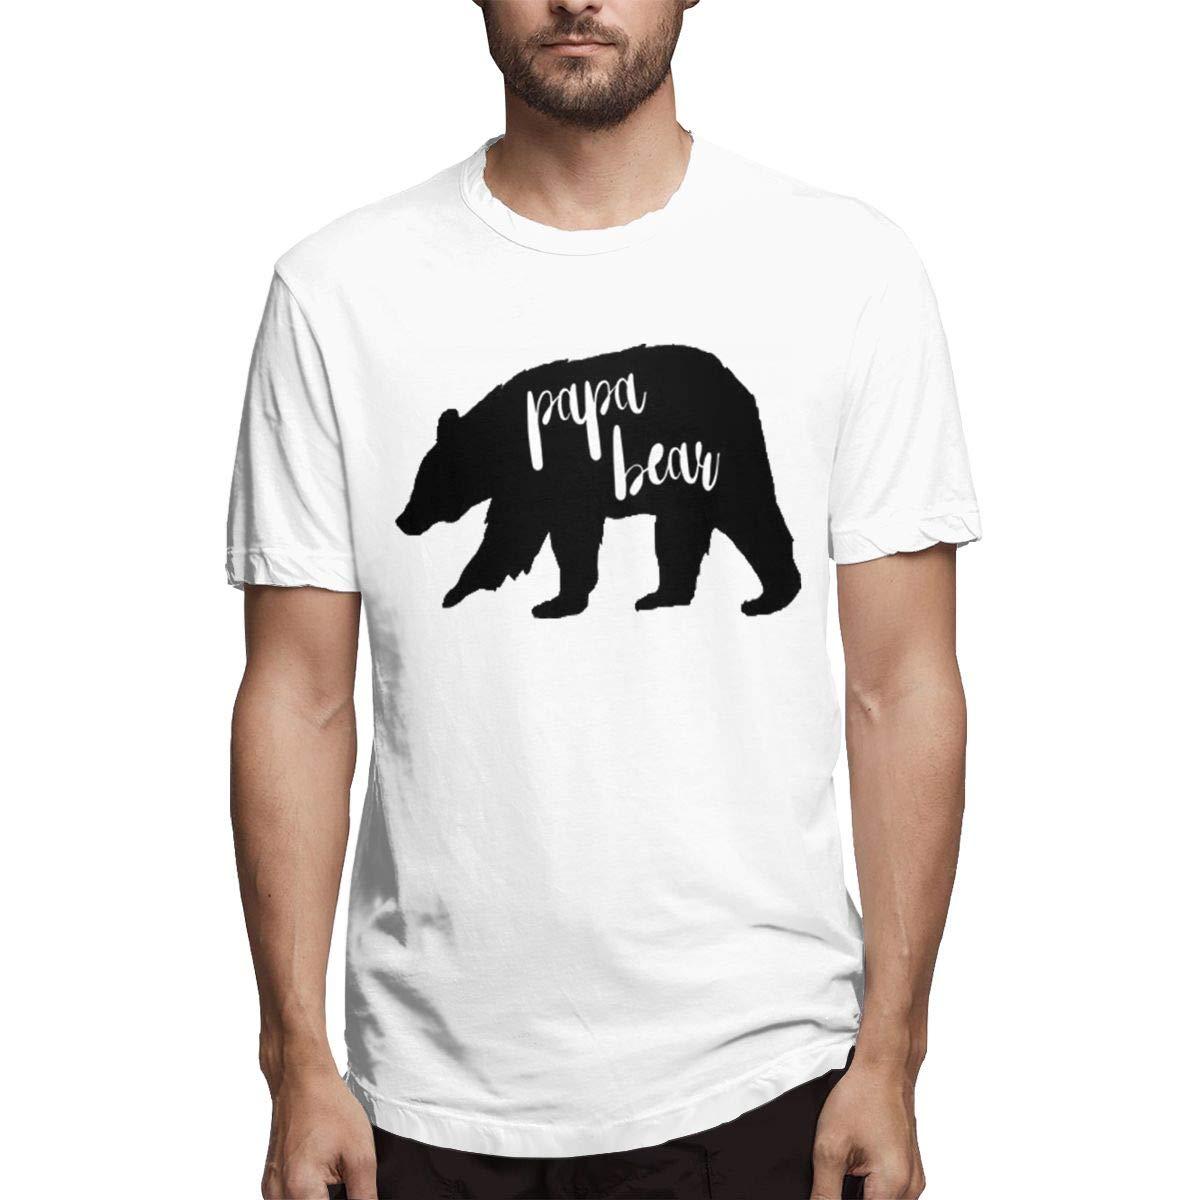 Marsherun S Papa Bear Short Sleeve T Shirts